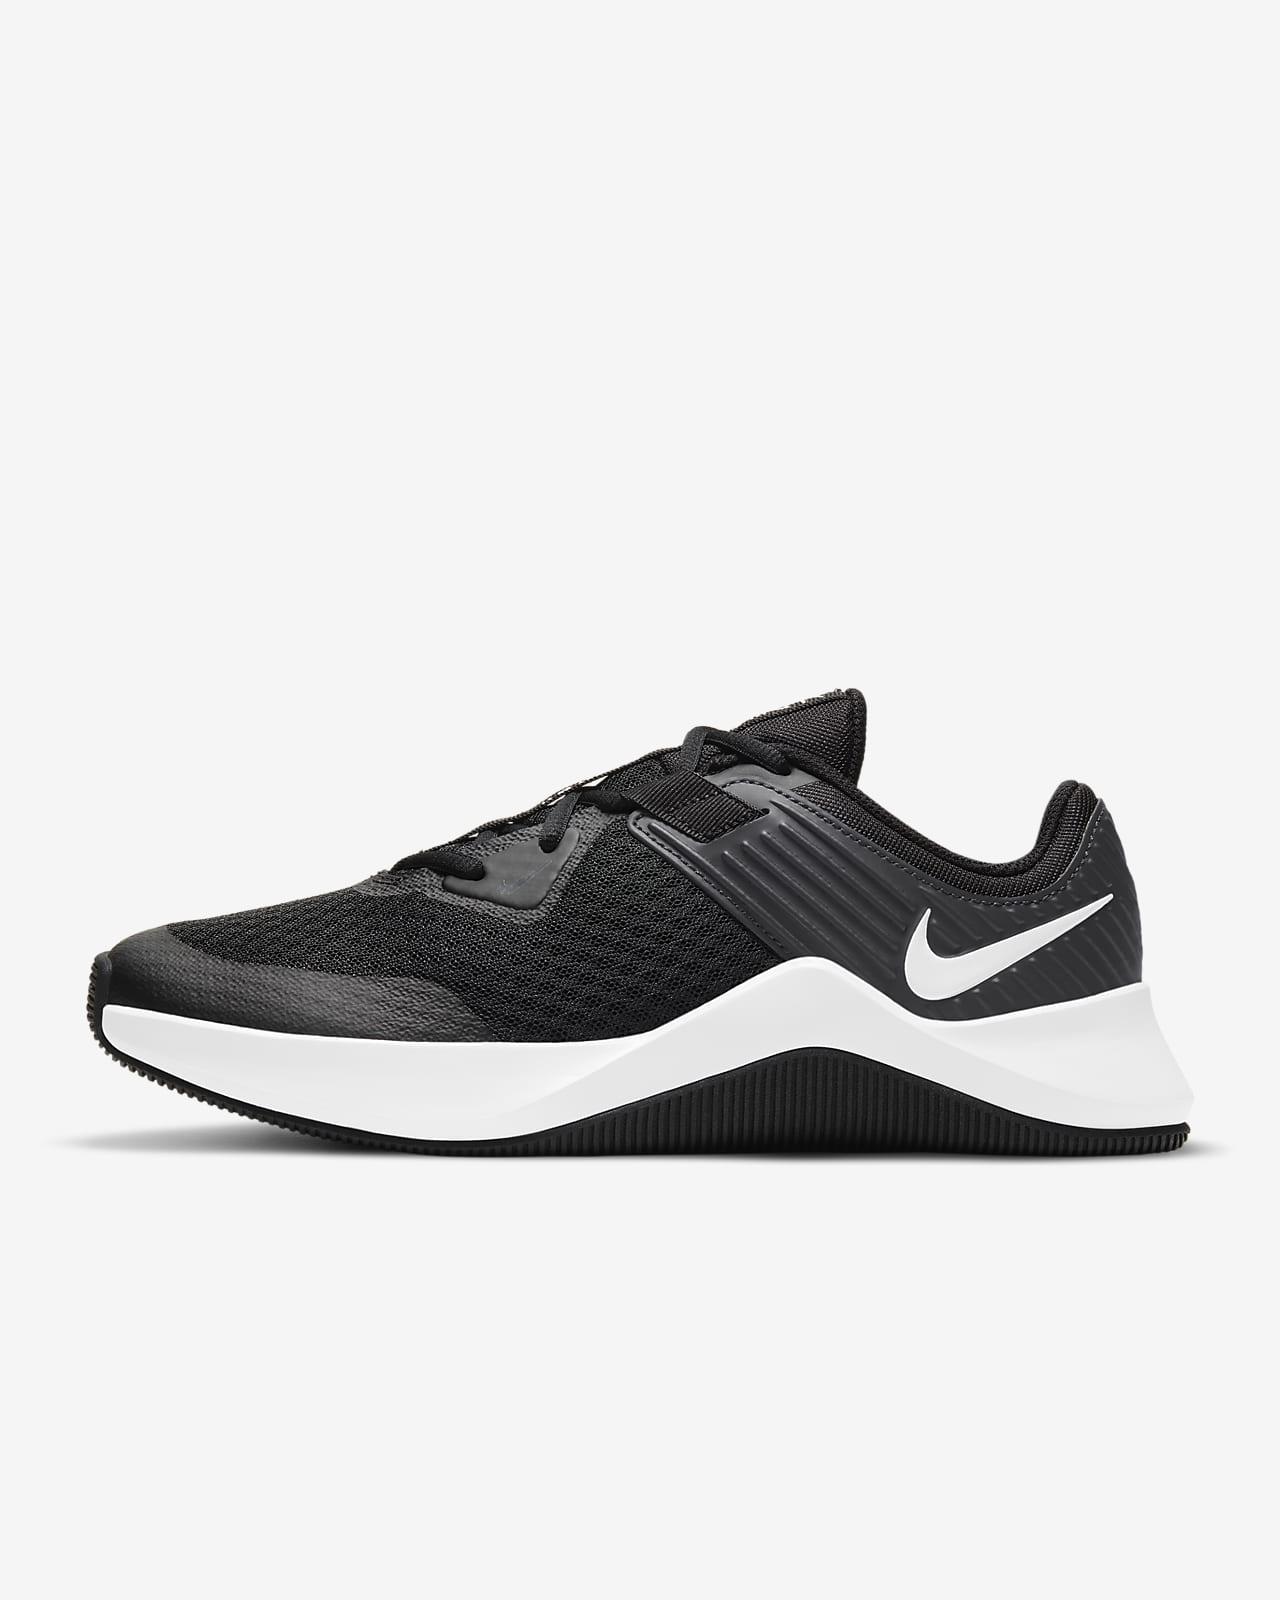 Nike MC Trainer Zapatillas de training - Mujer